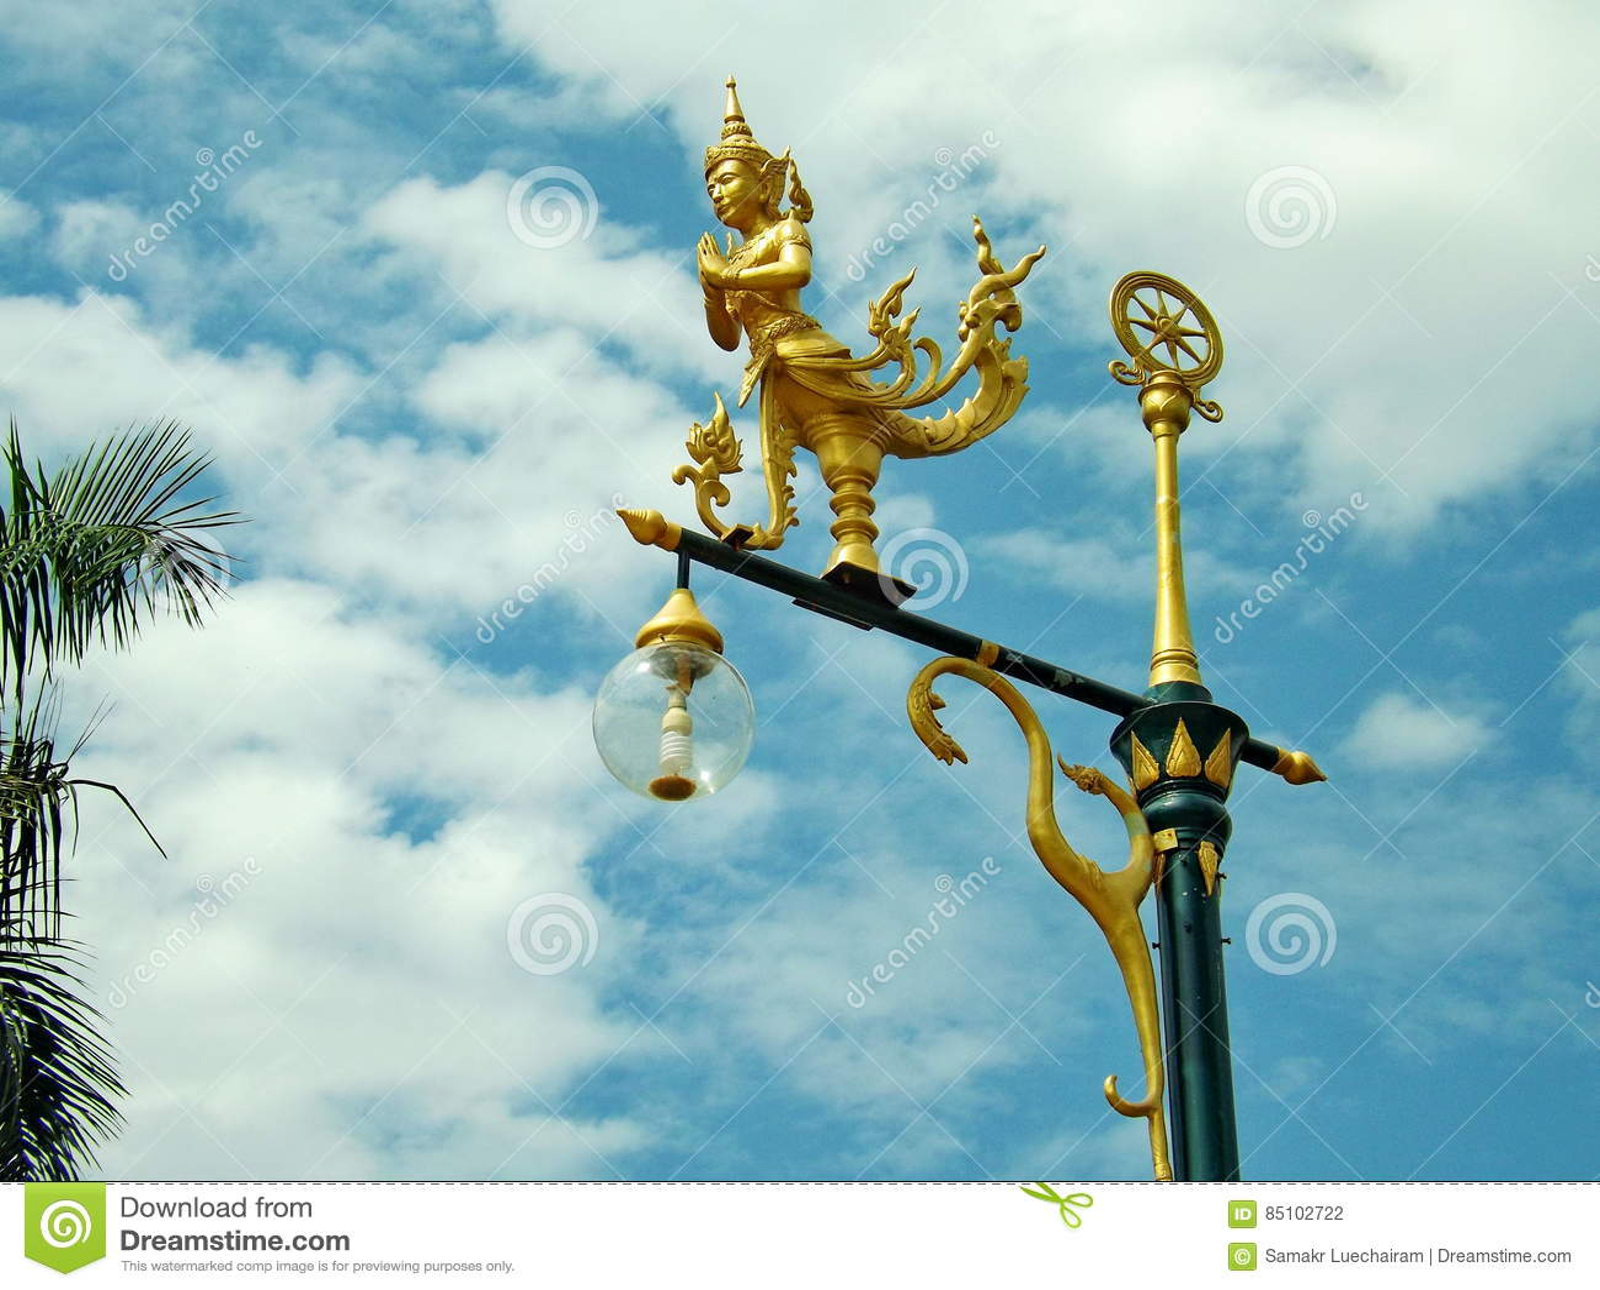 Gold angel on pole